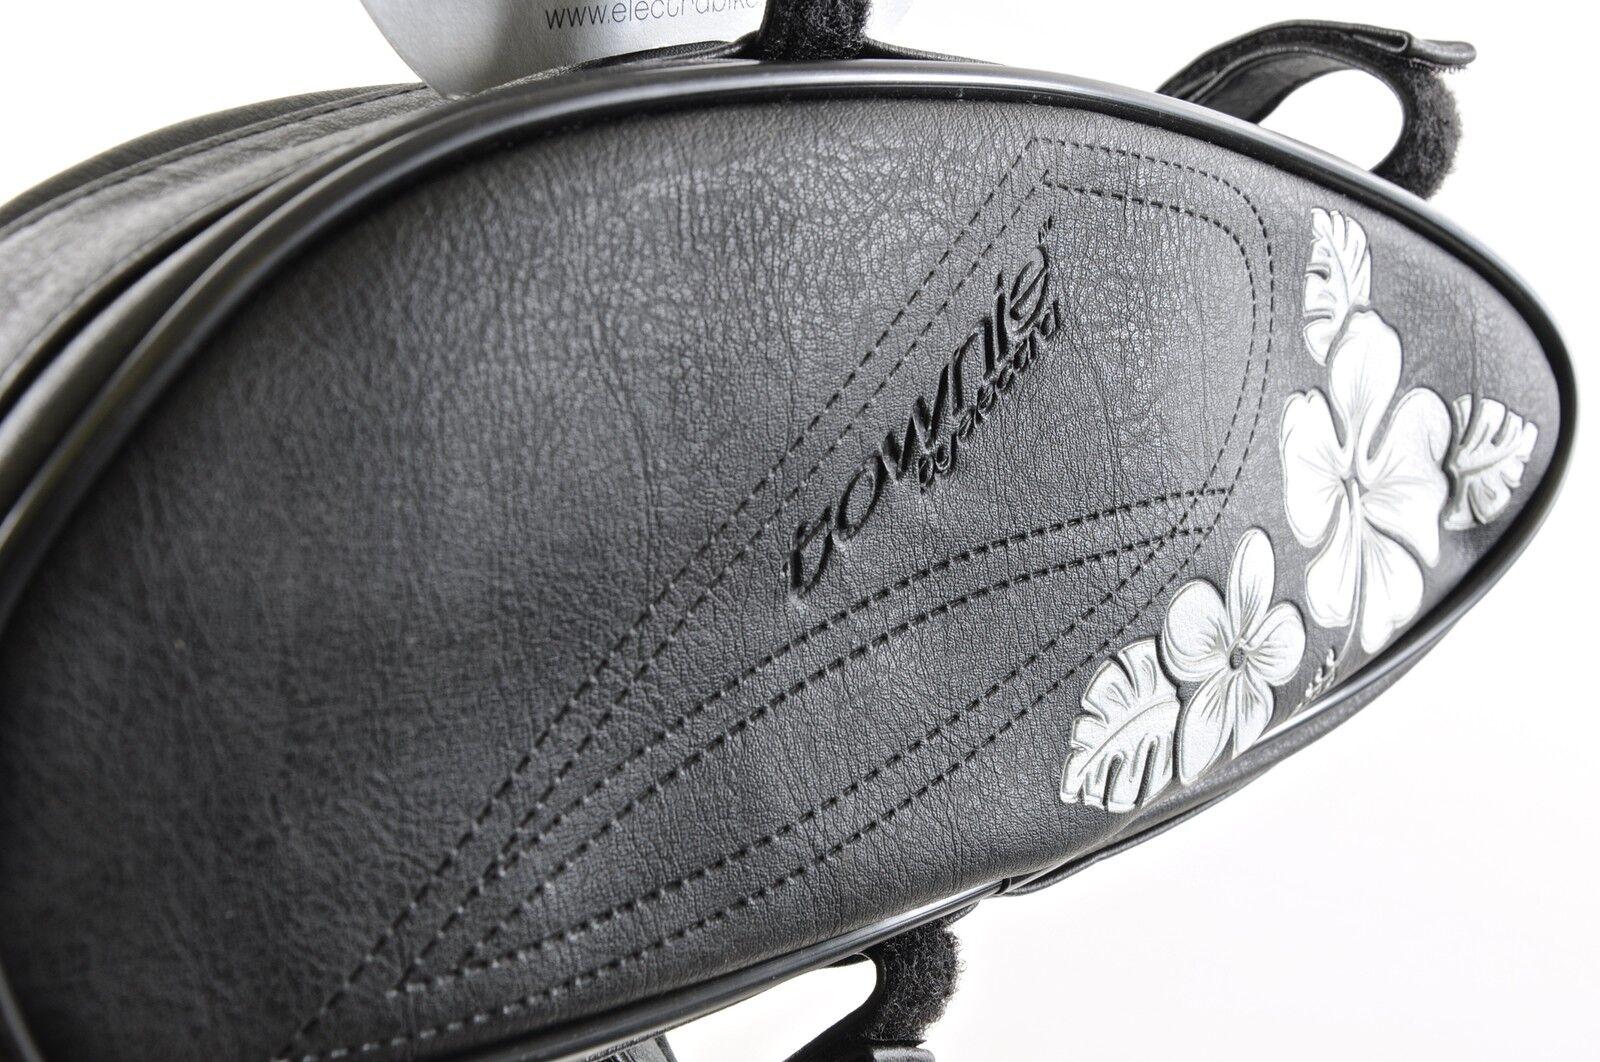 Electra Townie Femmes Cadre Sac Classe type USA type Classe Cruiser, DRAGSTER motif fleuri noir cae635